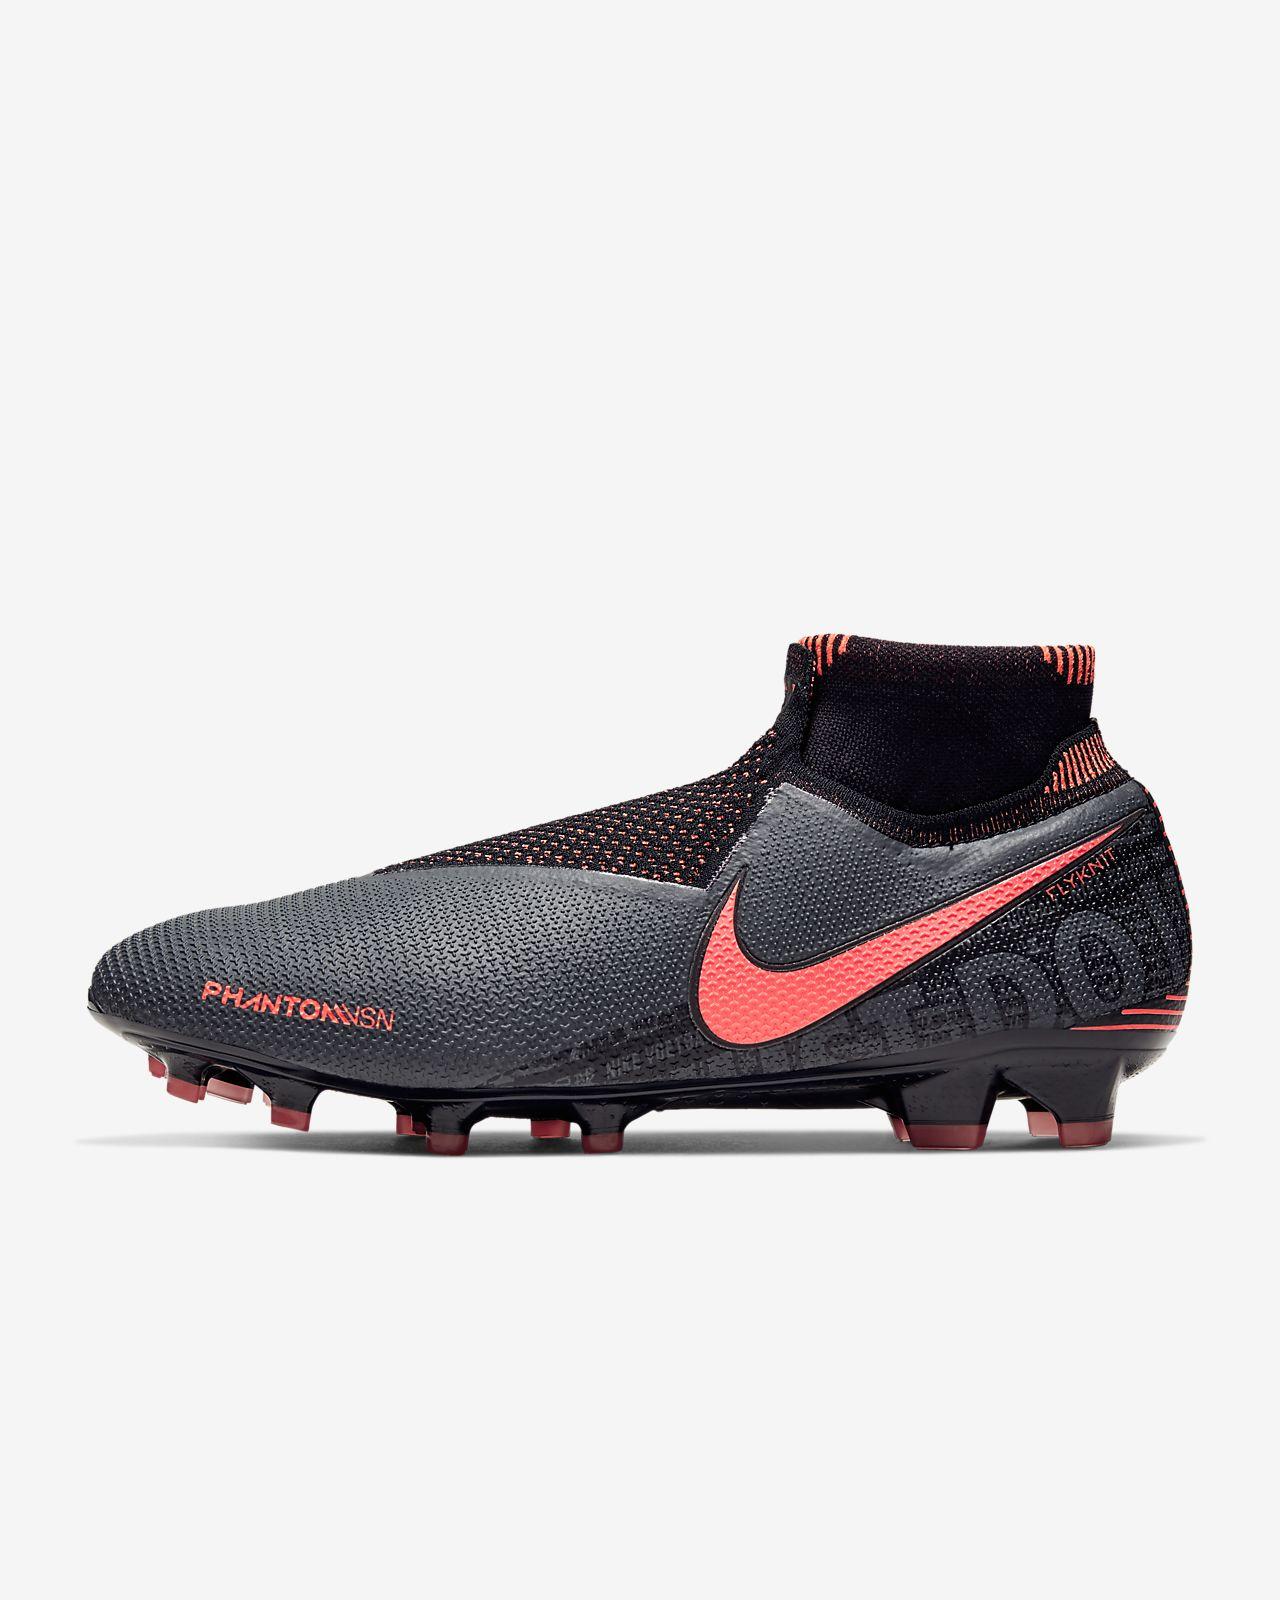 Scarpa da calcio per terreni duri Nike Phantom Vision Elite Dynamic Fit FG